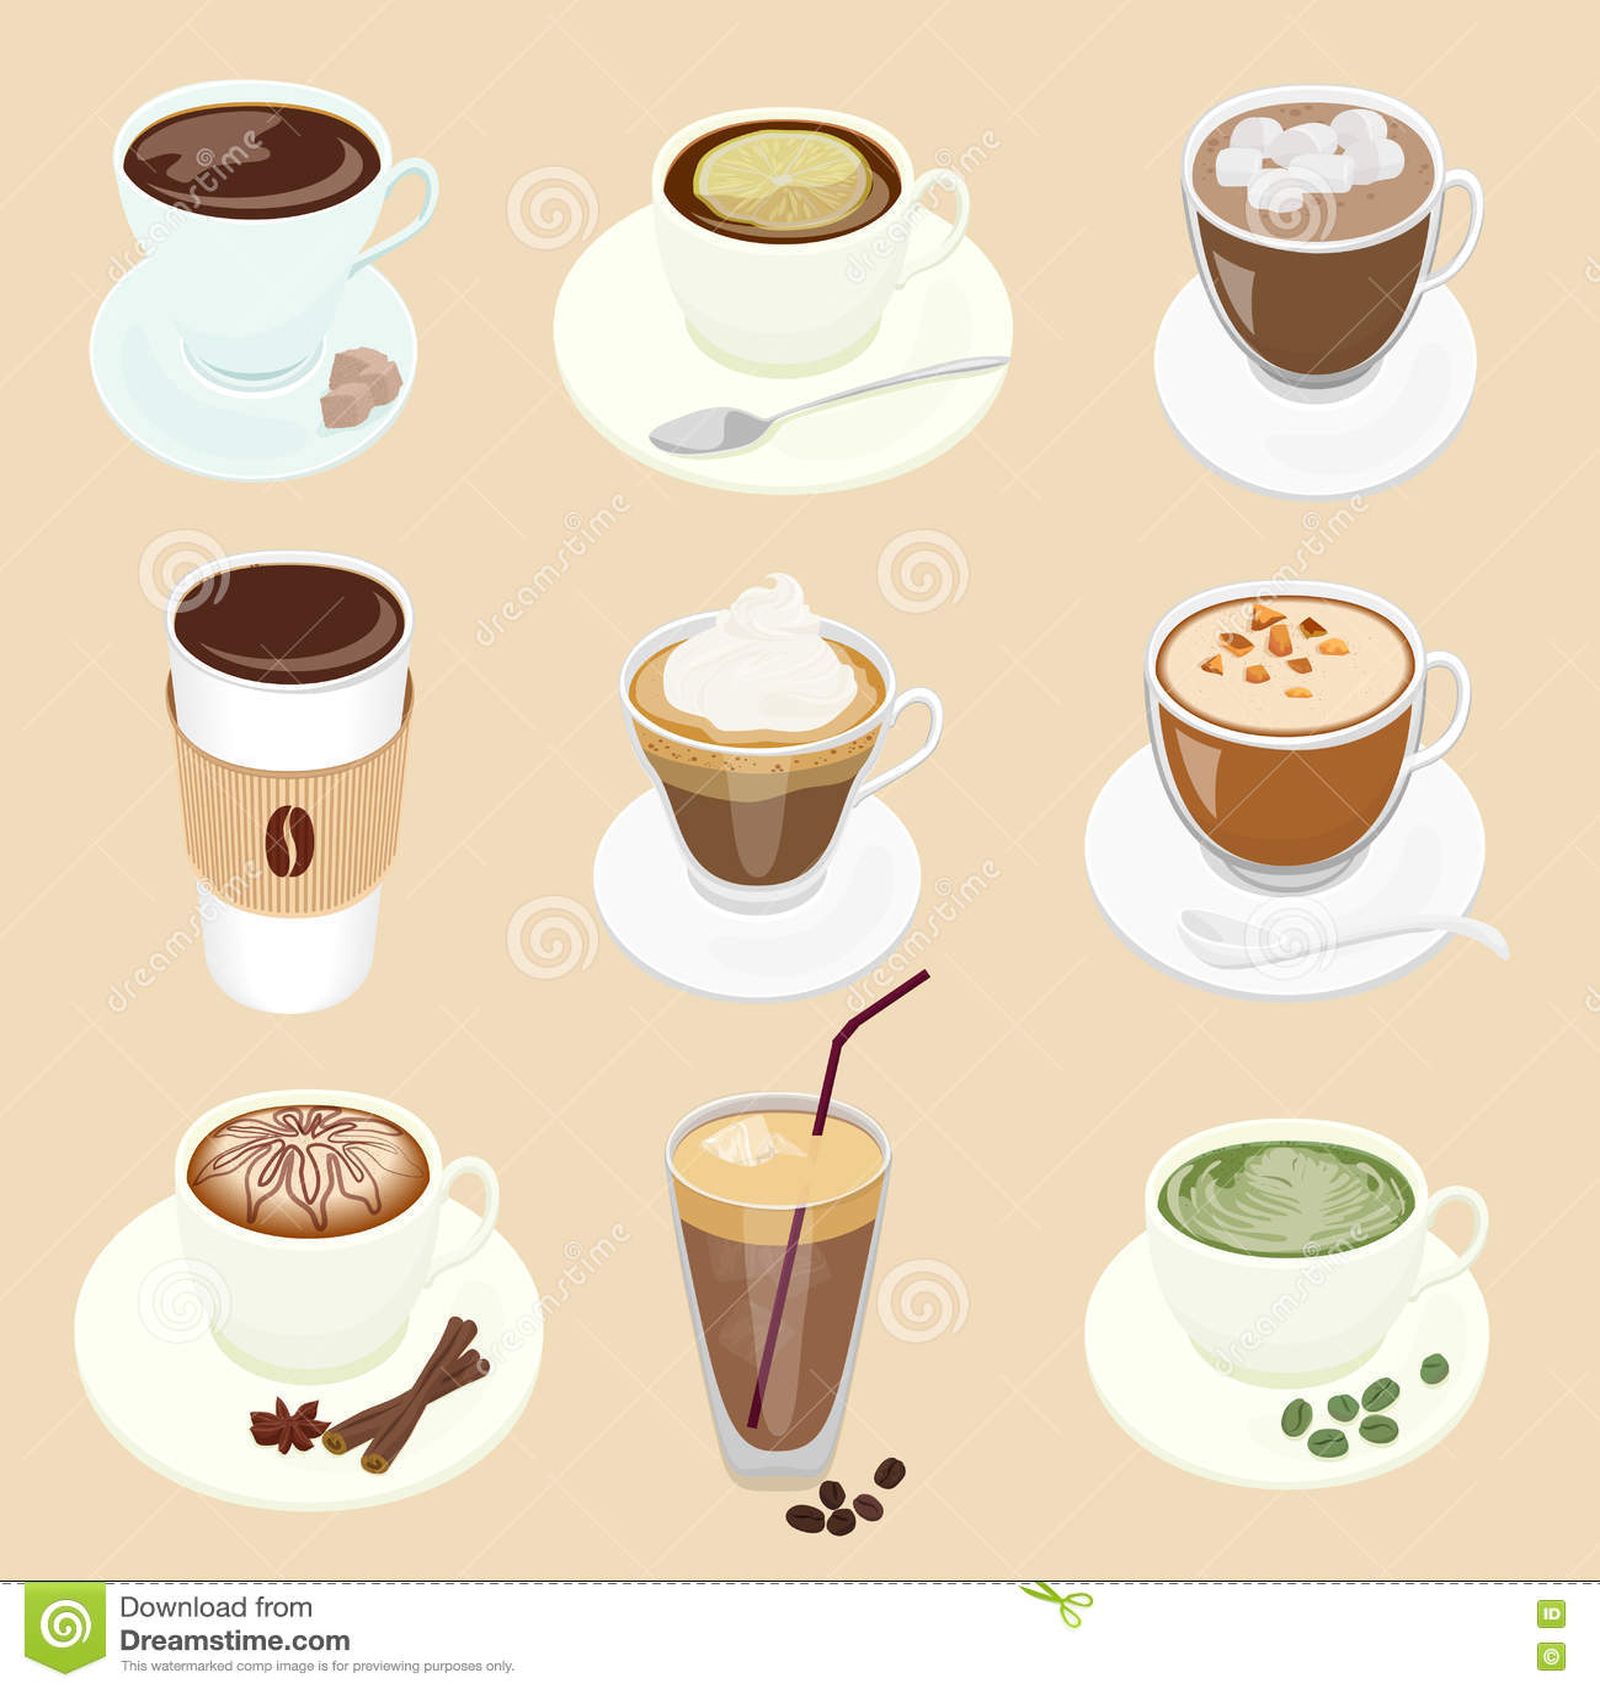 Cafe Latte Restaurant Menu